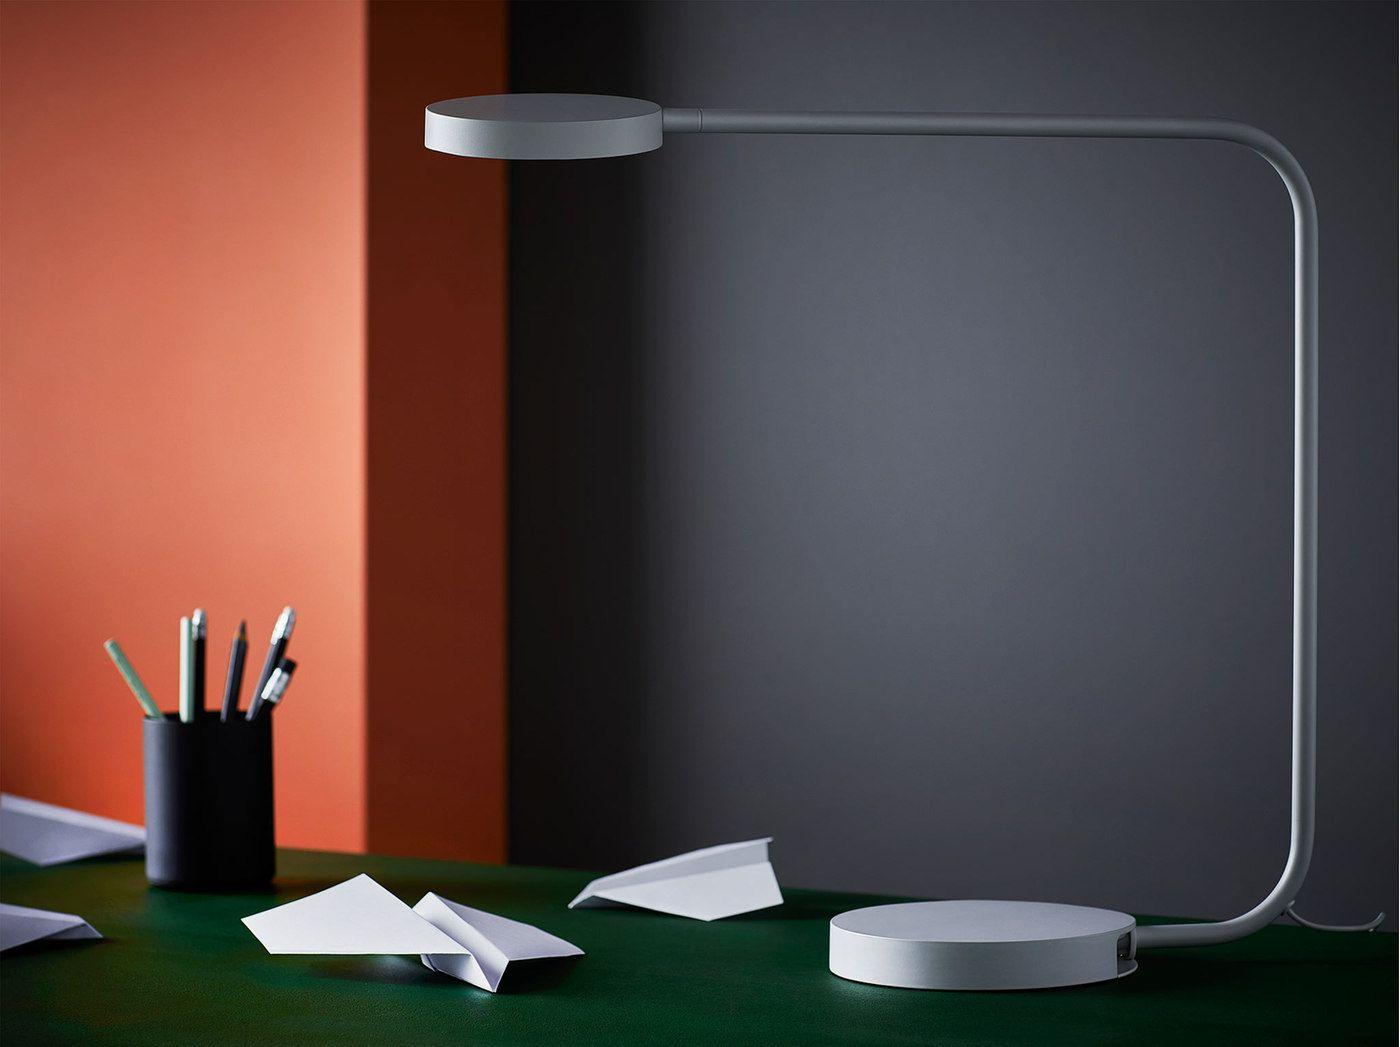 Lampe led a pince ikea inspiré stockholm design house lamp best